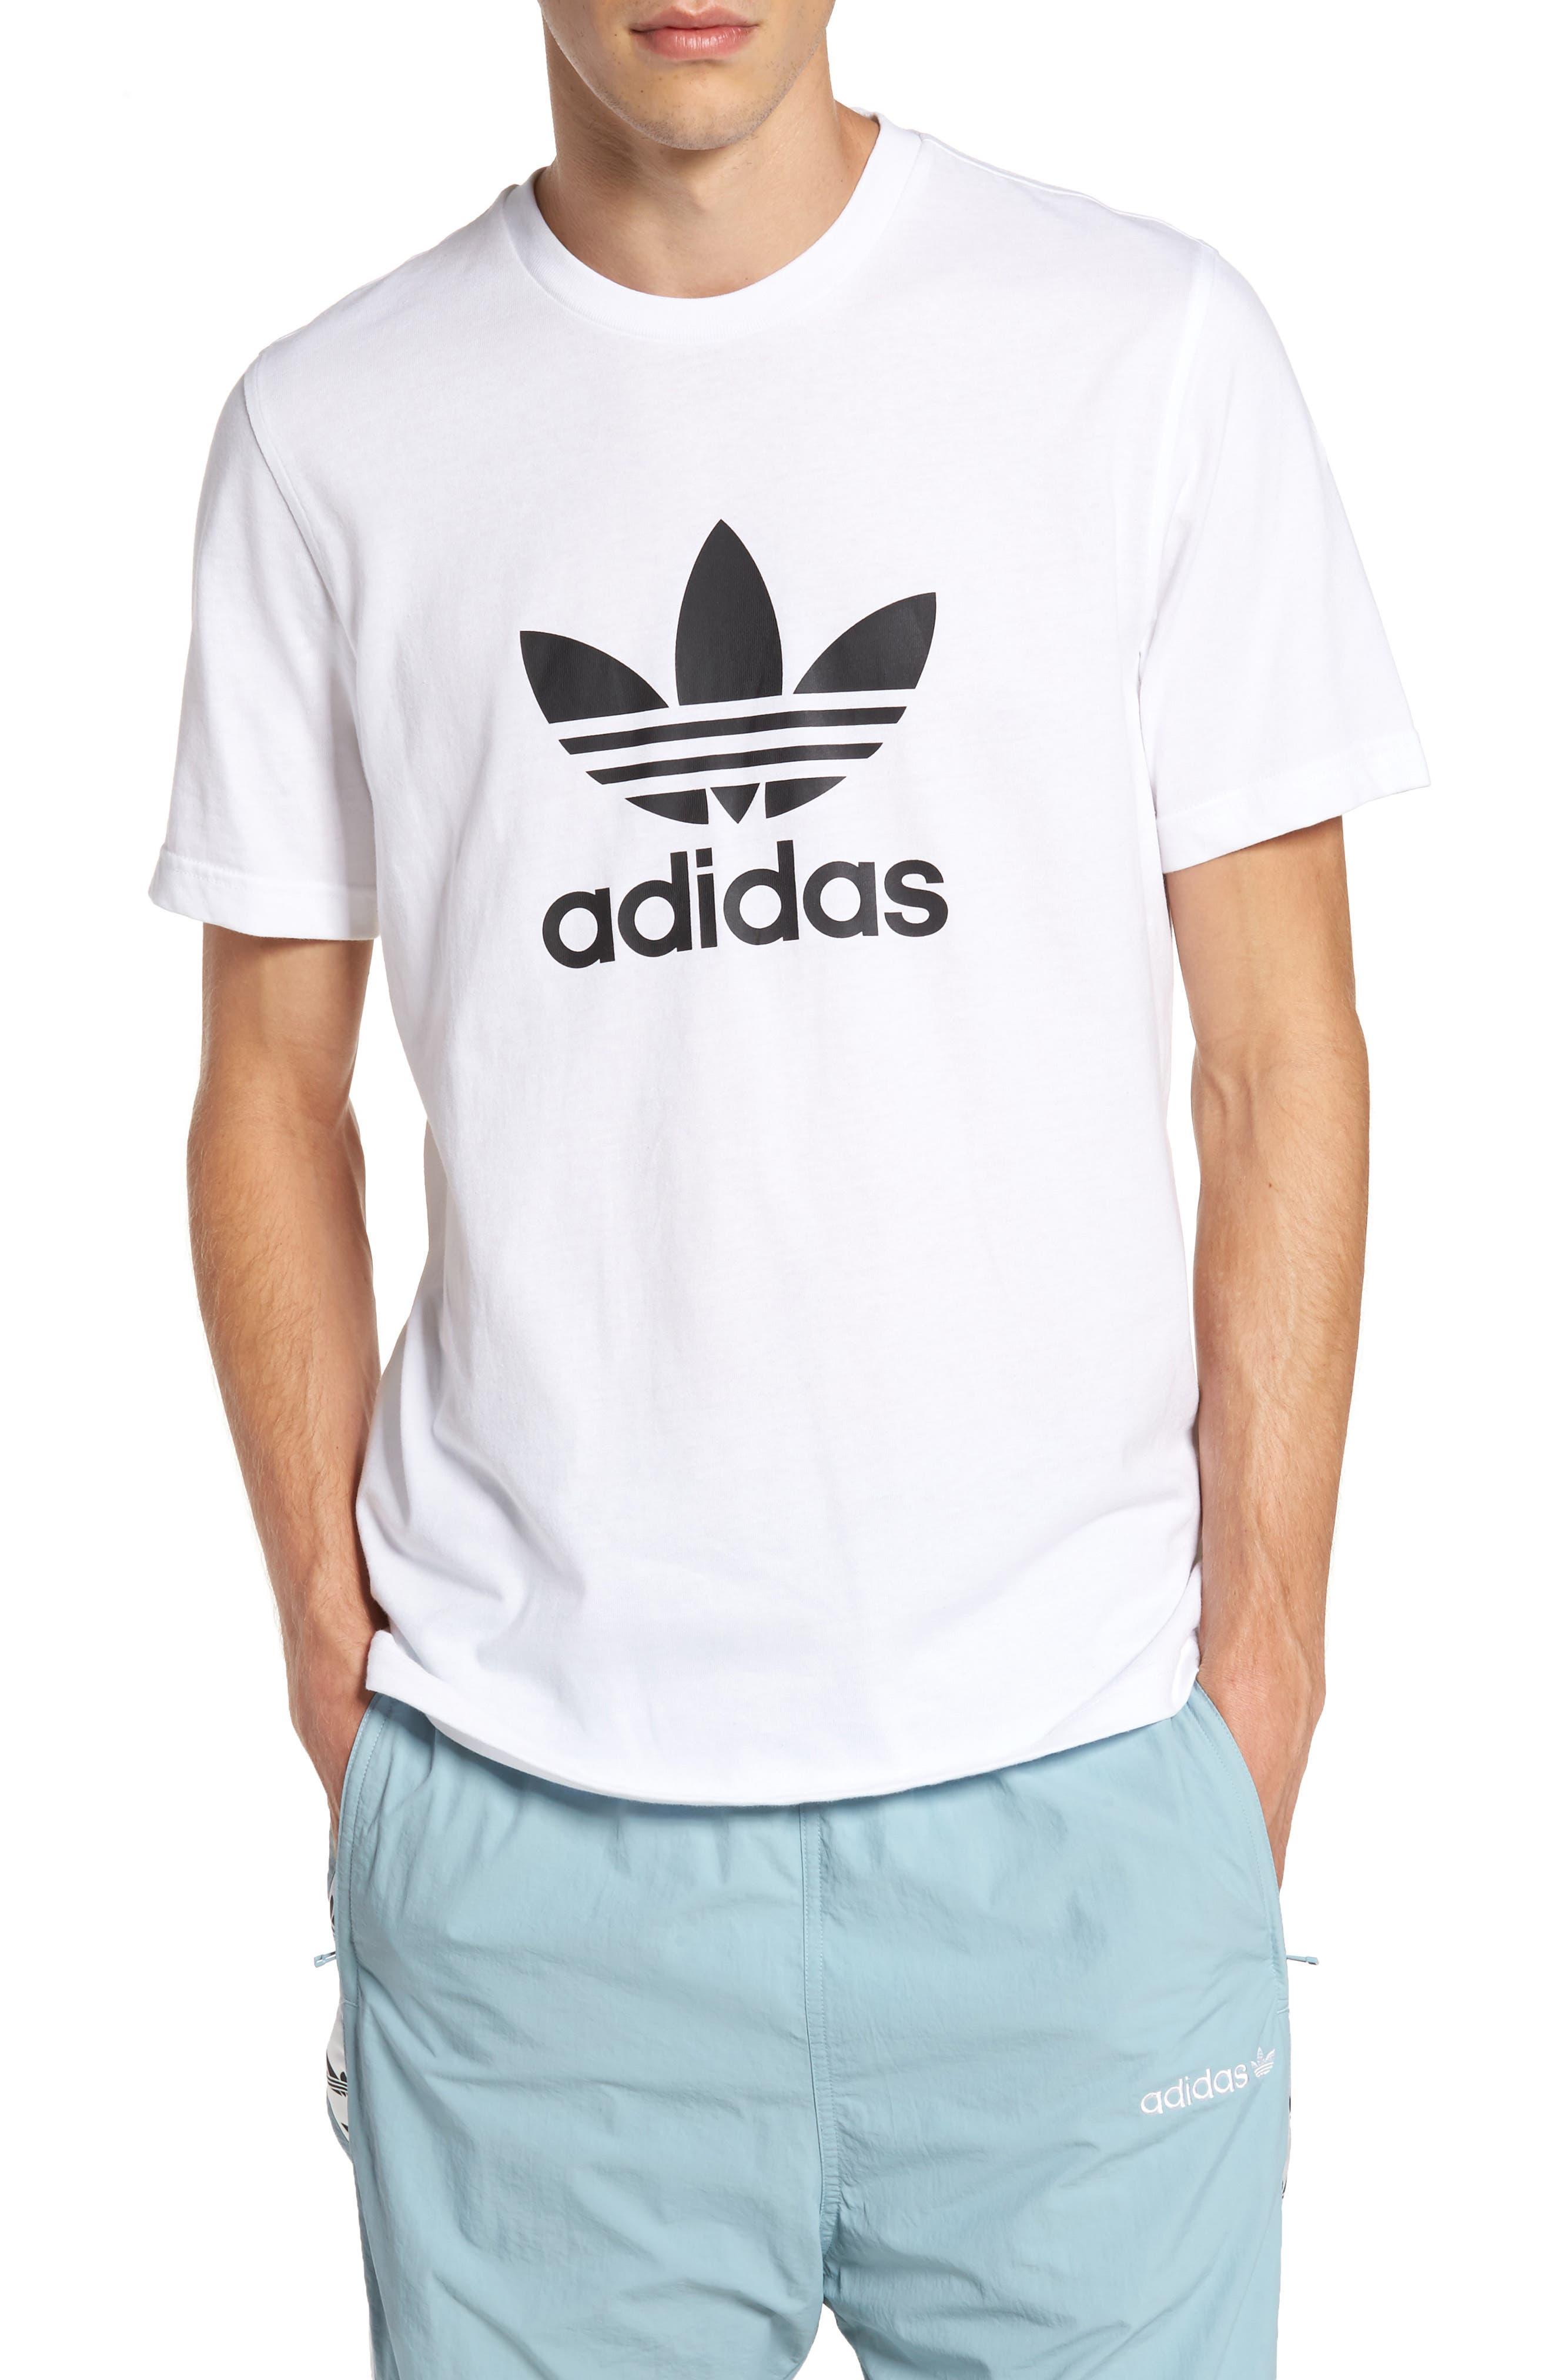 adidas t shirt full hand